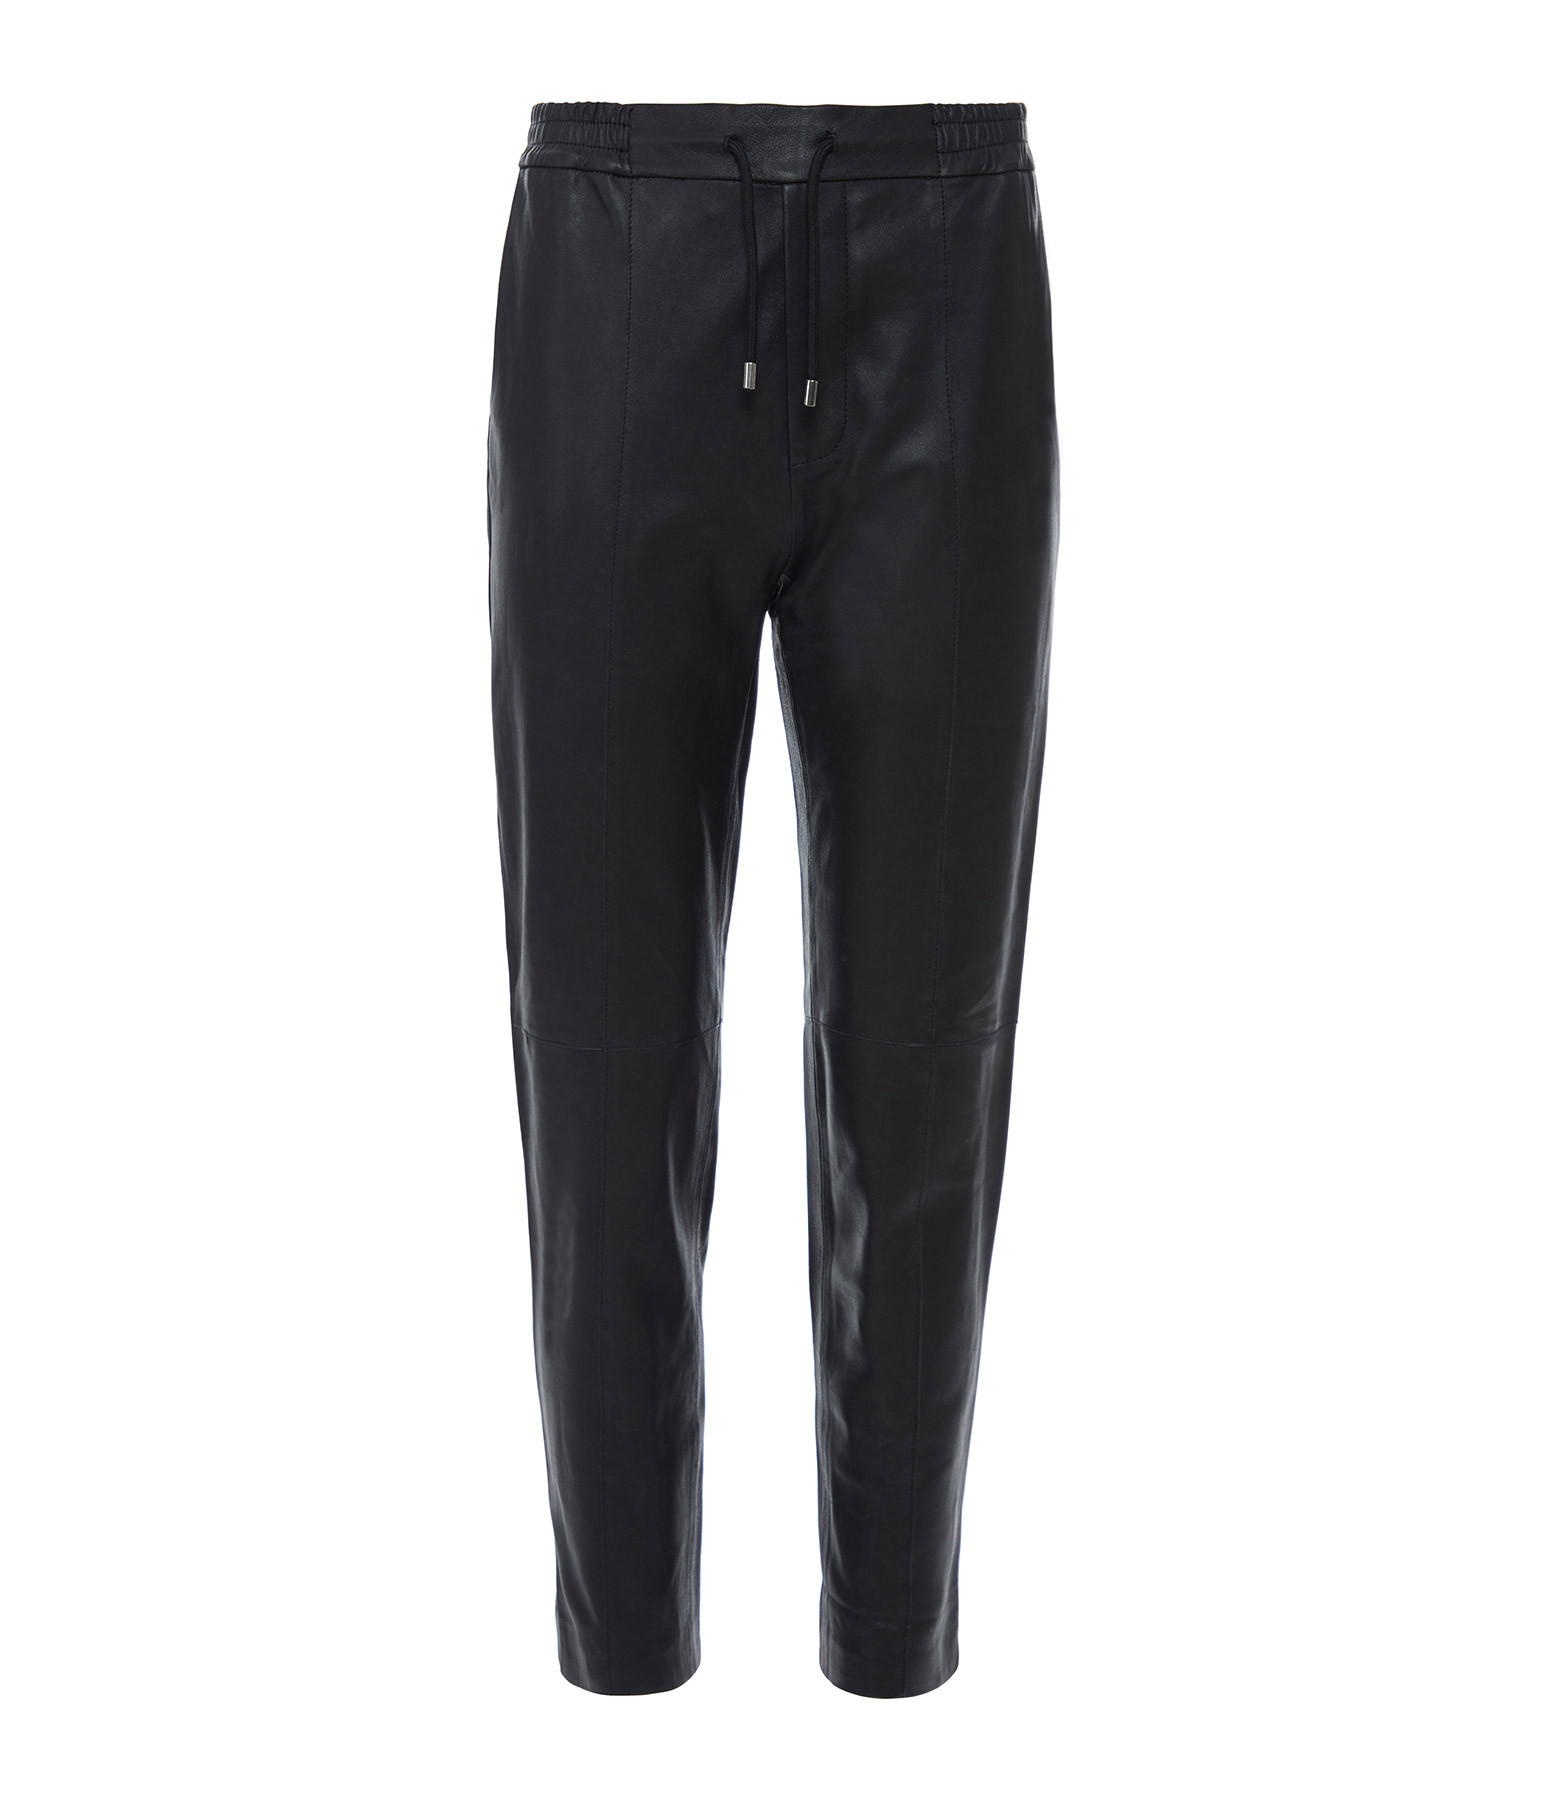 VENTCOUVERT - Pantalon Plumstar Noir